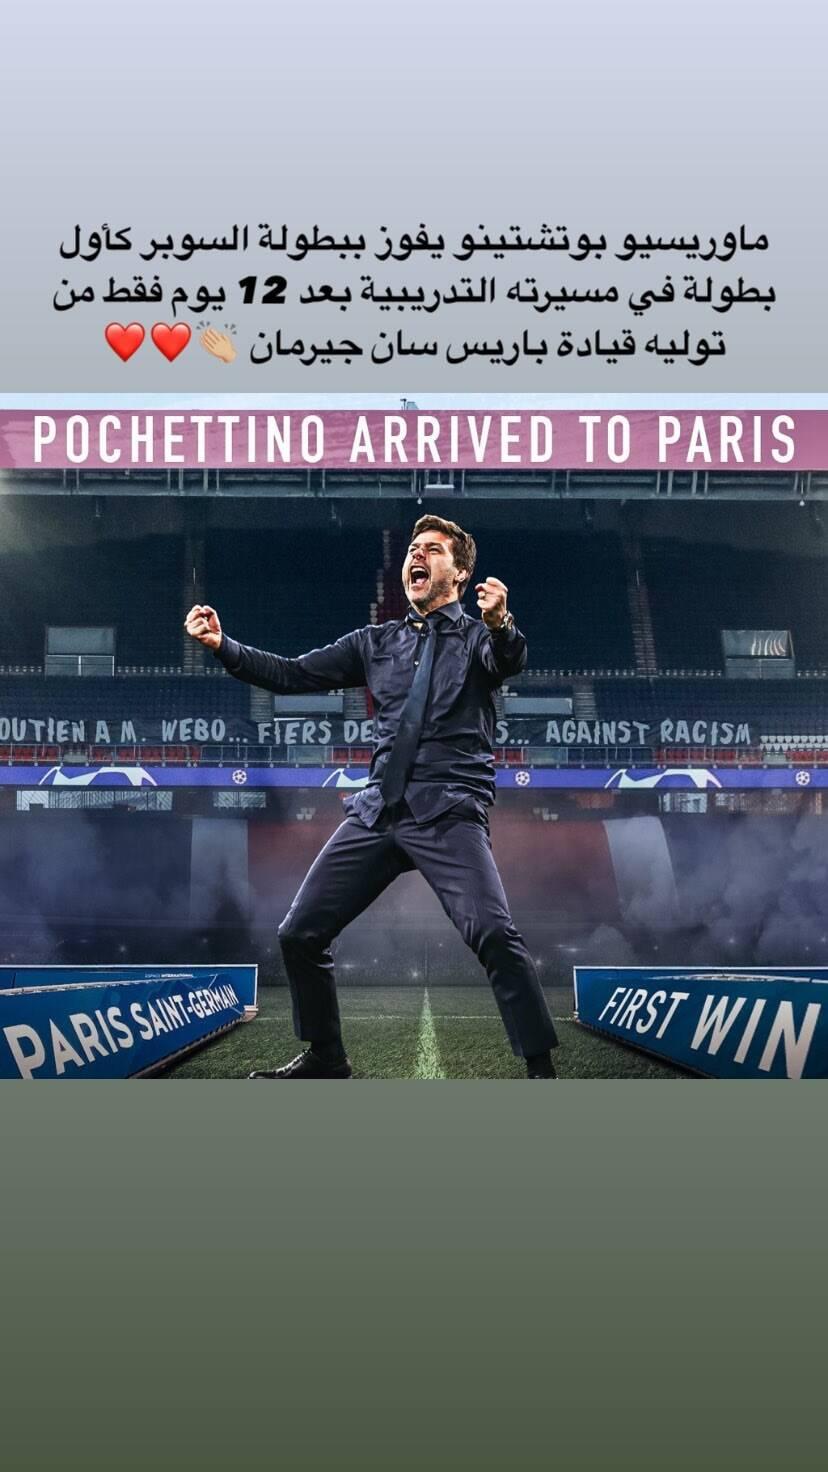 Paris Saint Germain by alaa saleh